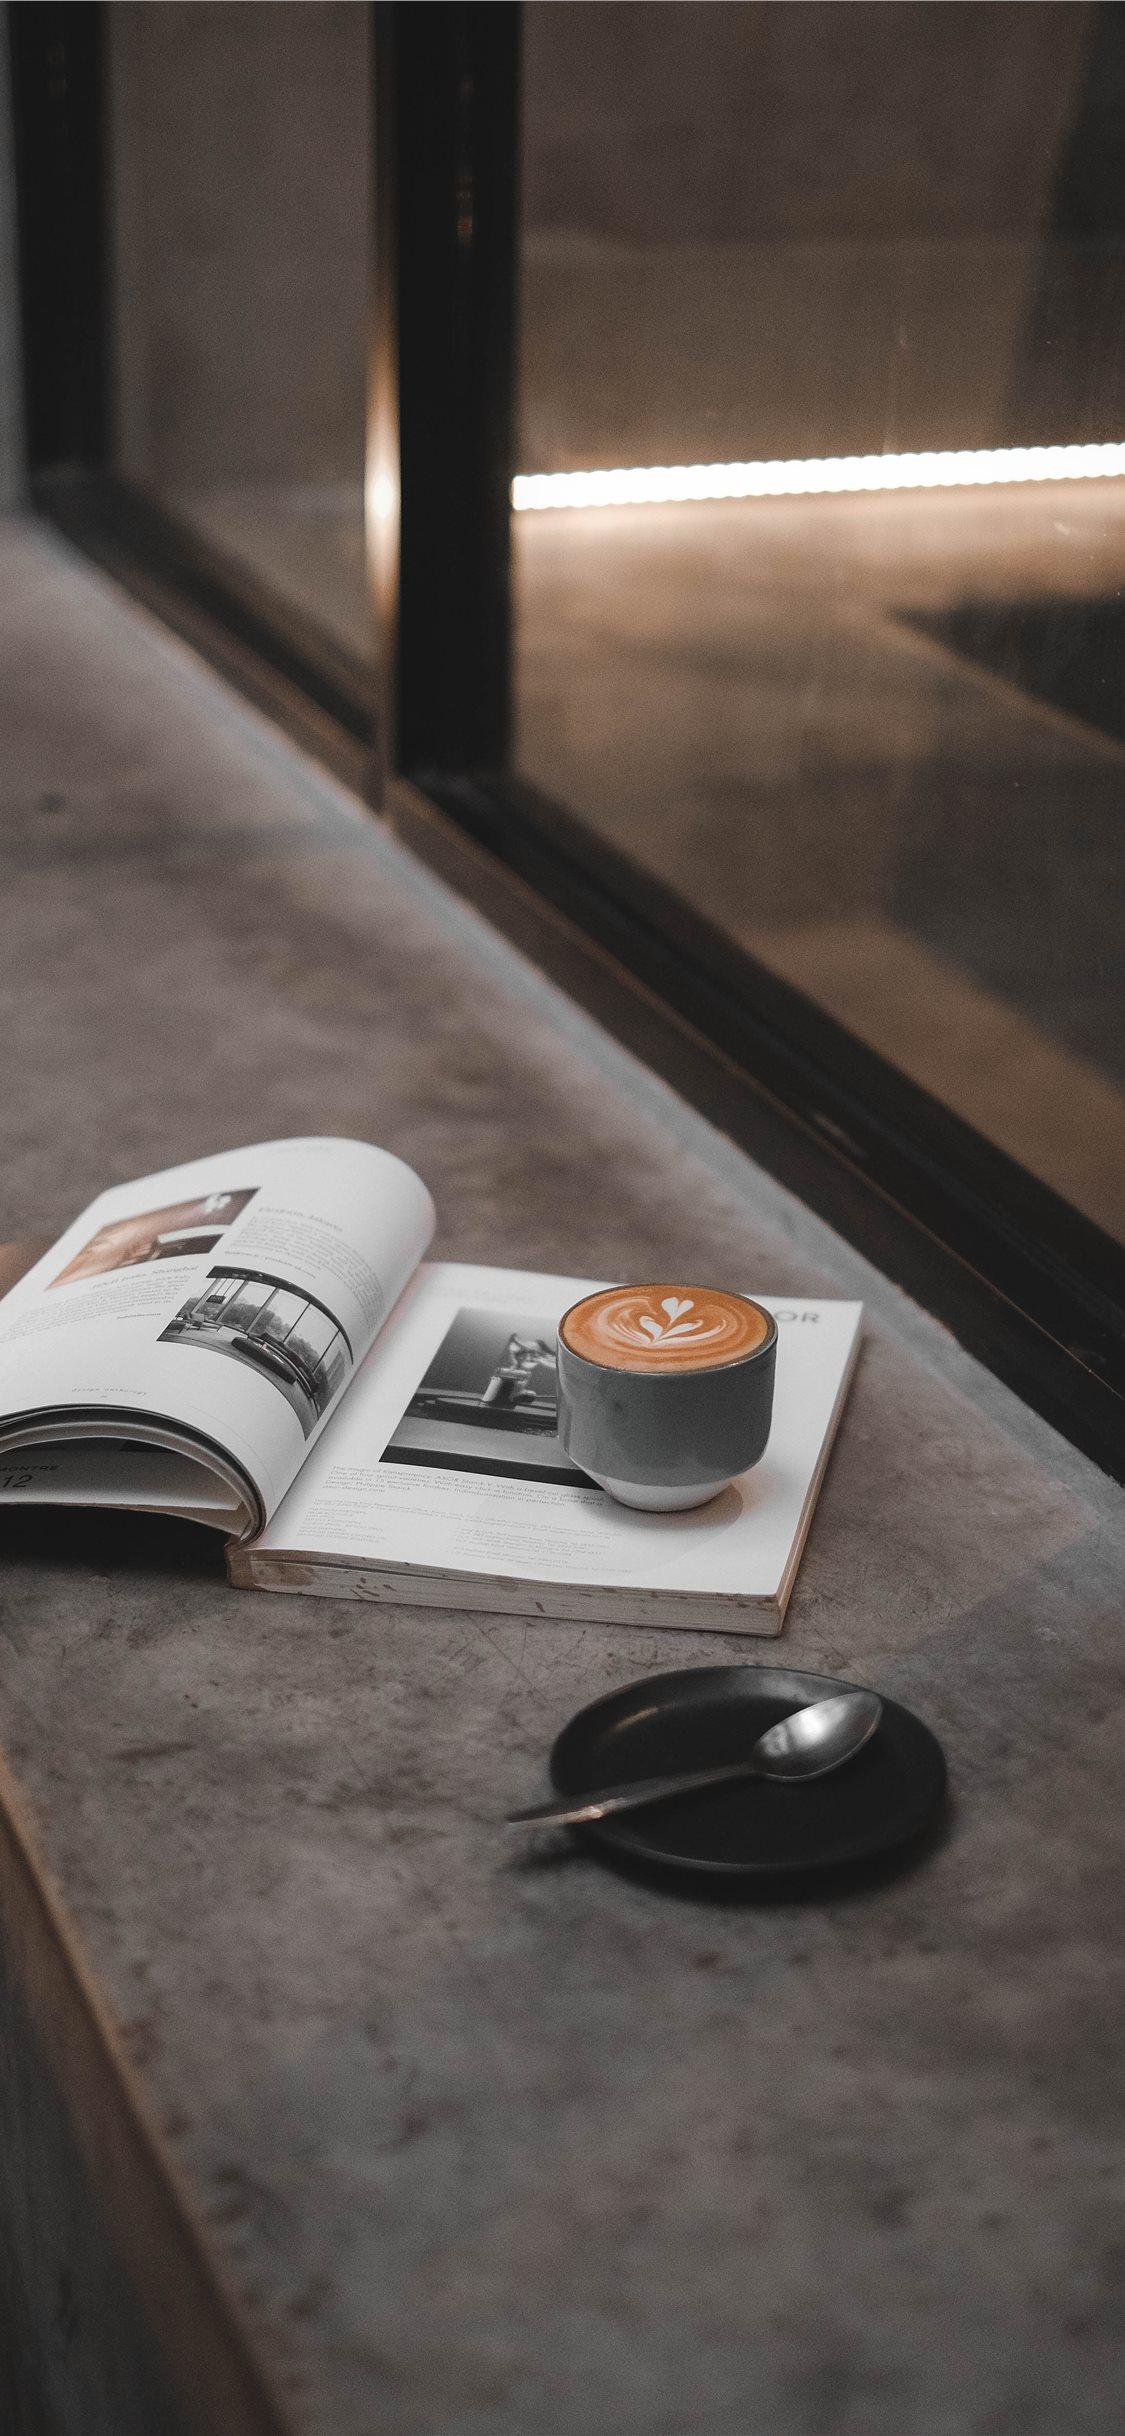 Best Book Iphone X Wallpapers Hd 2020 Ilikewallpaper